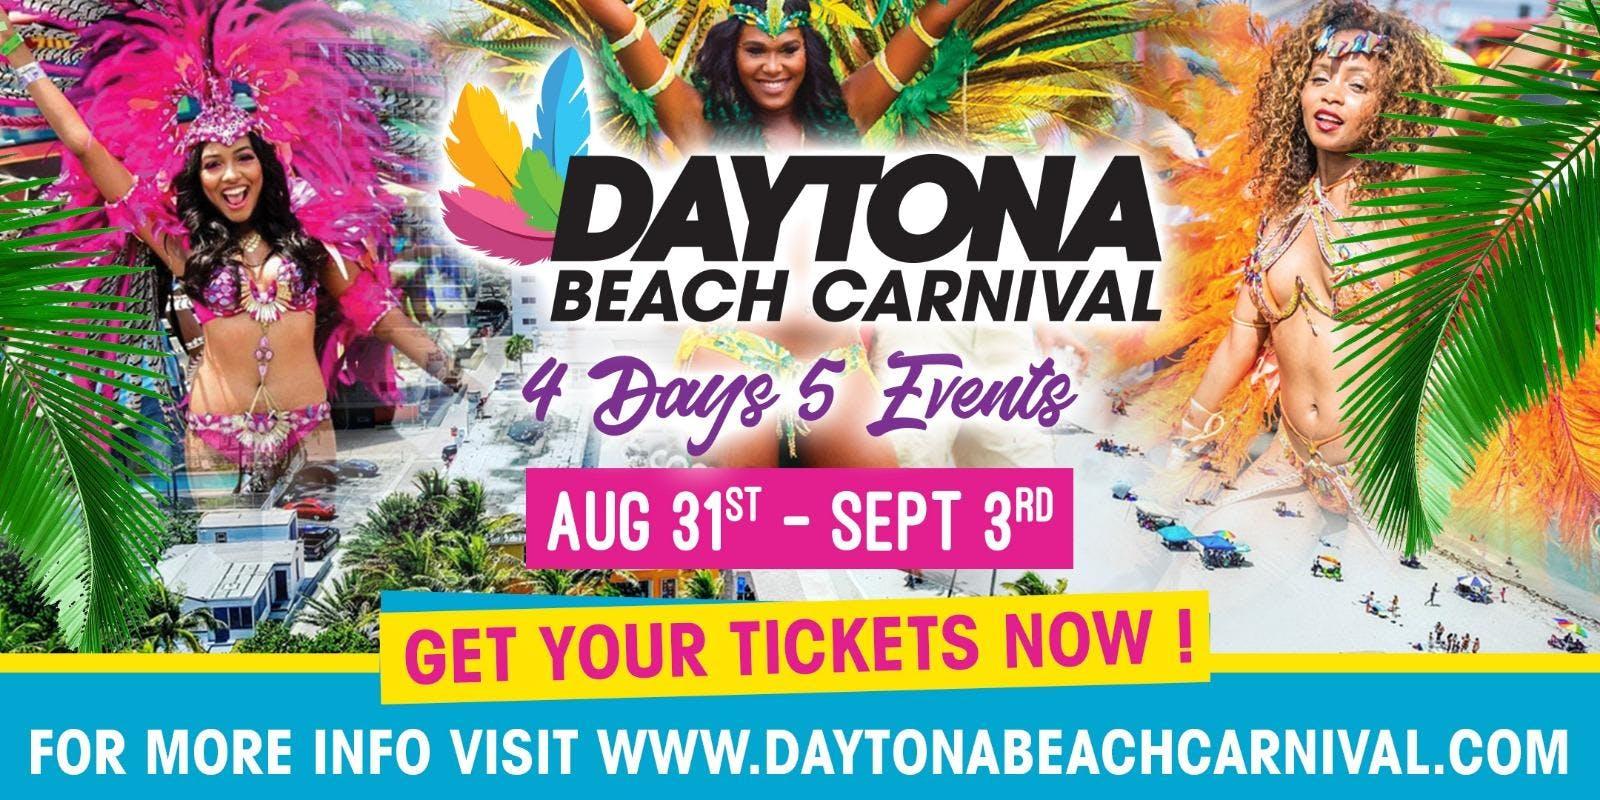 Daytona Beach Carnival Weekend P